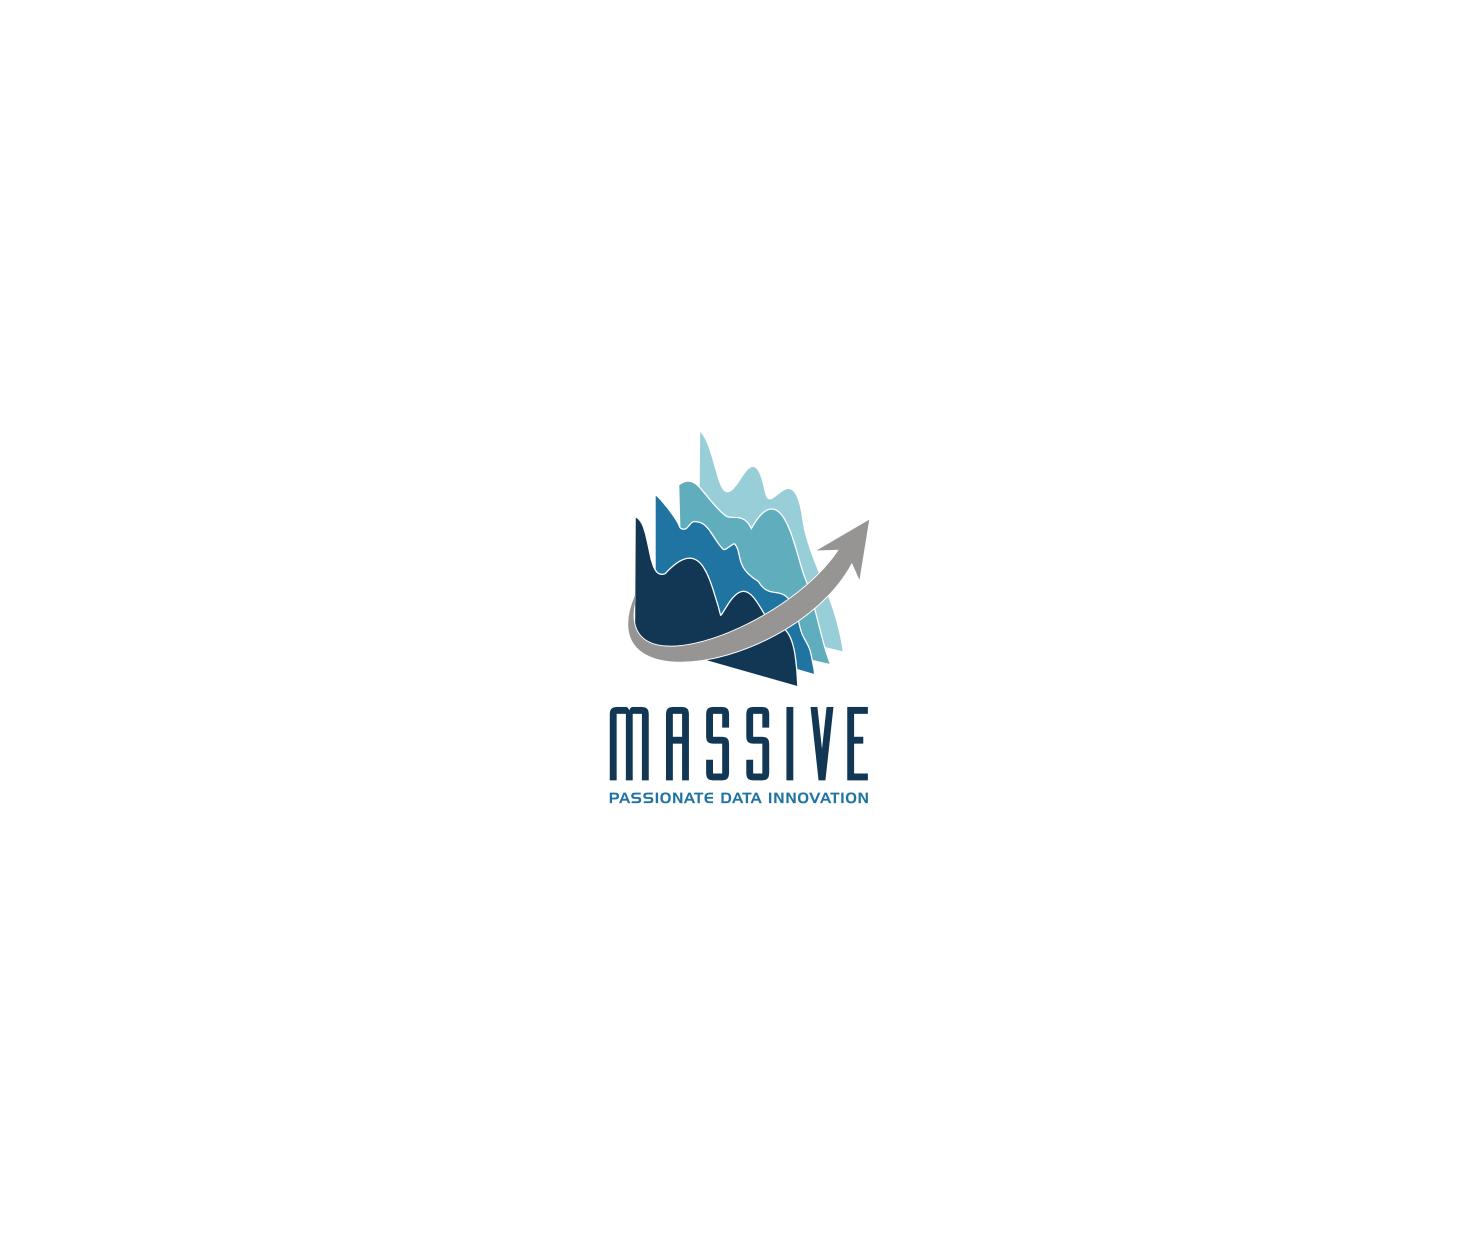 Logo Design by Sigitumarali Sigit - Entry No. 458 in the Logo Design Contest MASSIVE LOGO.